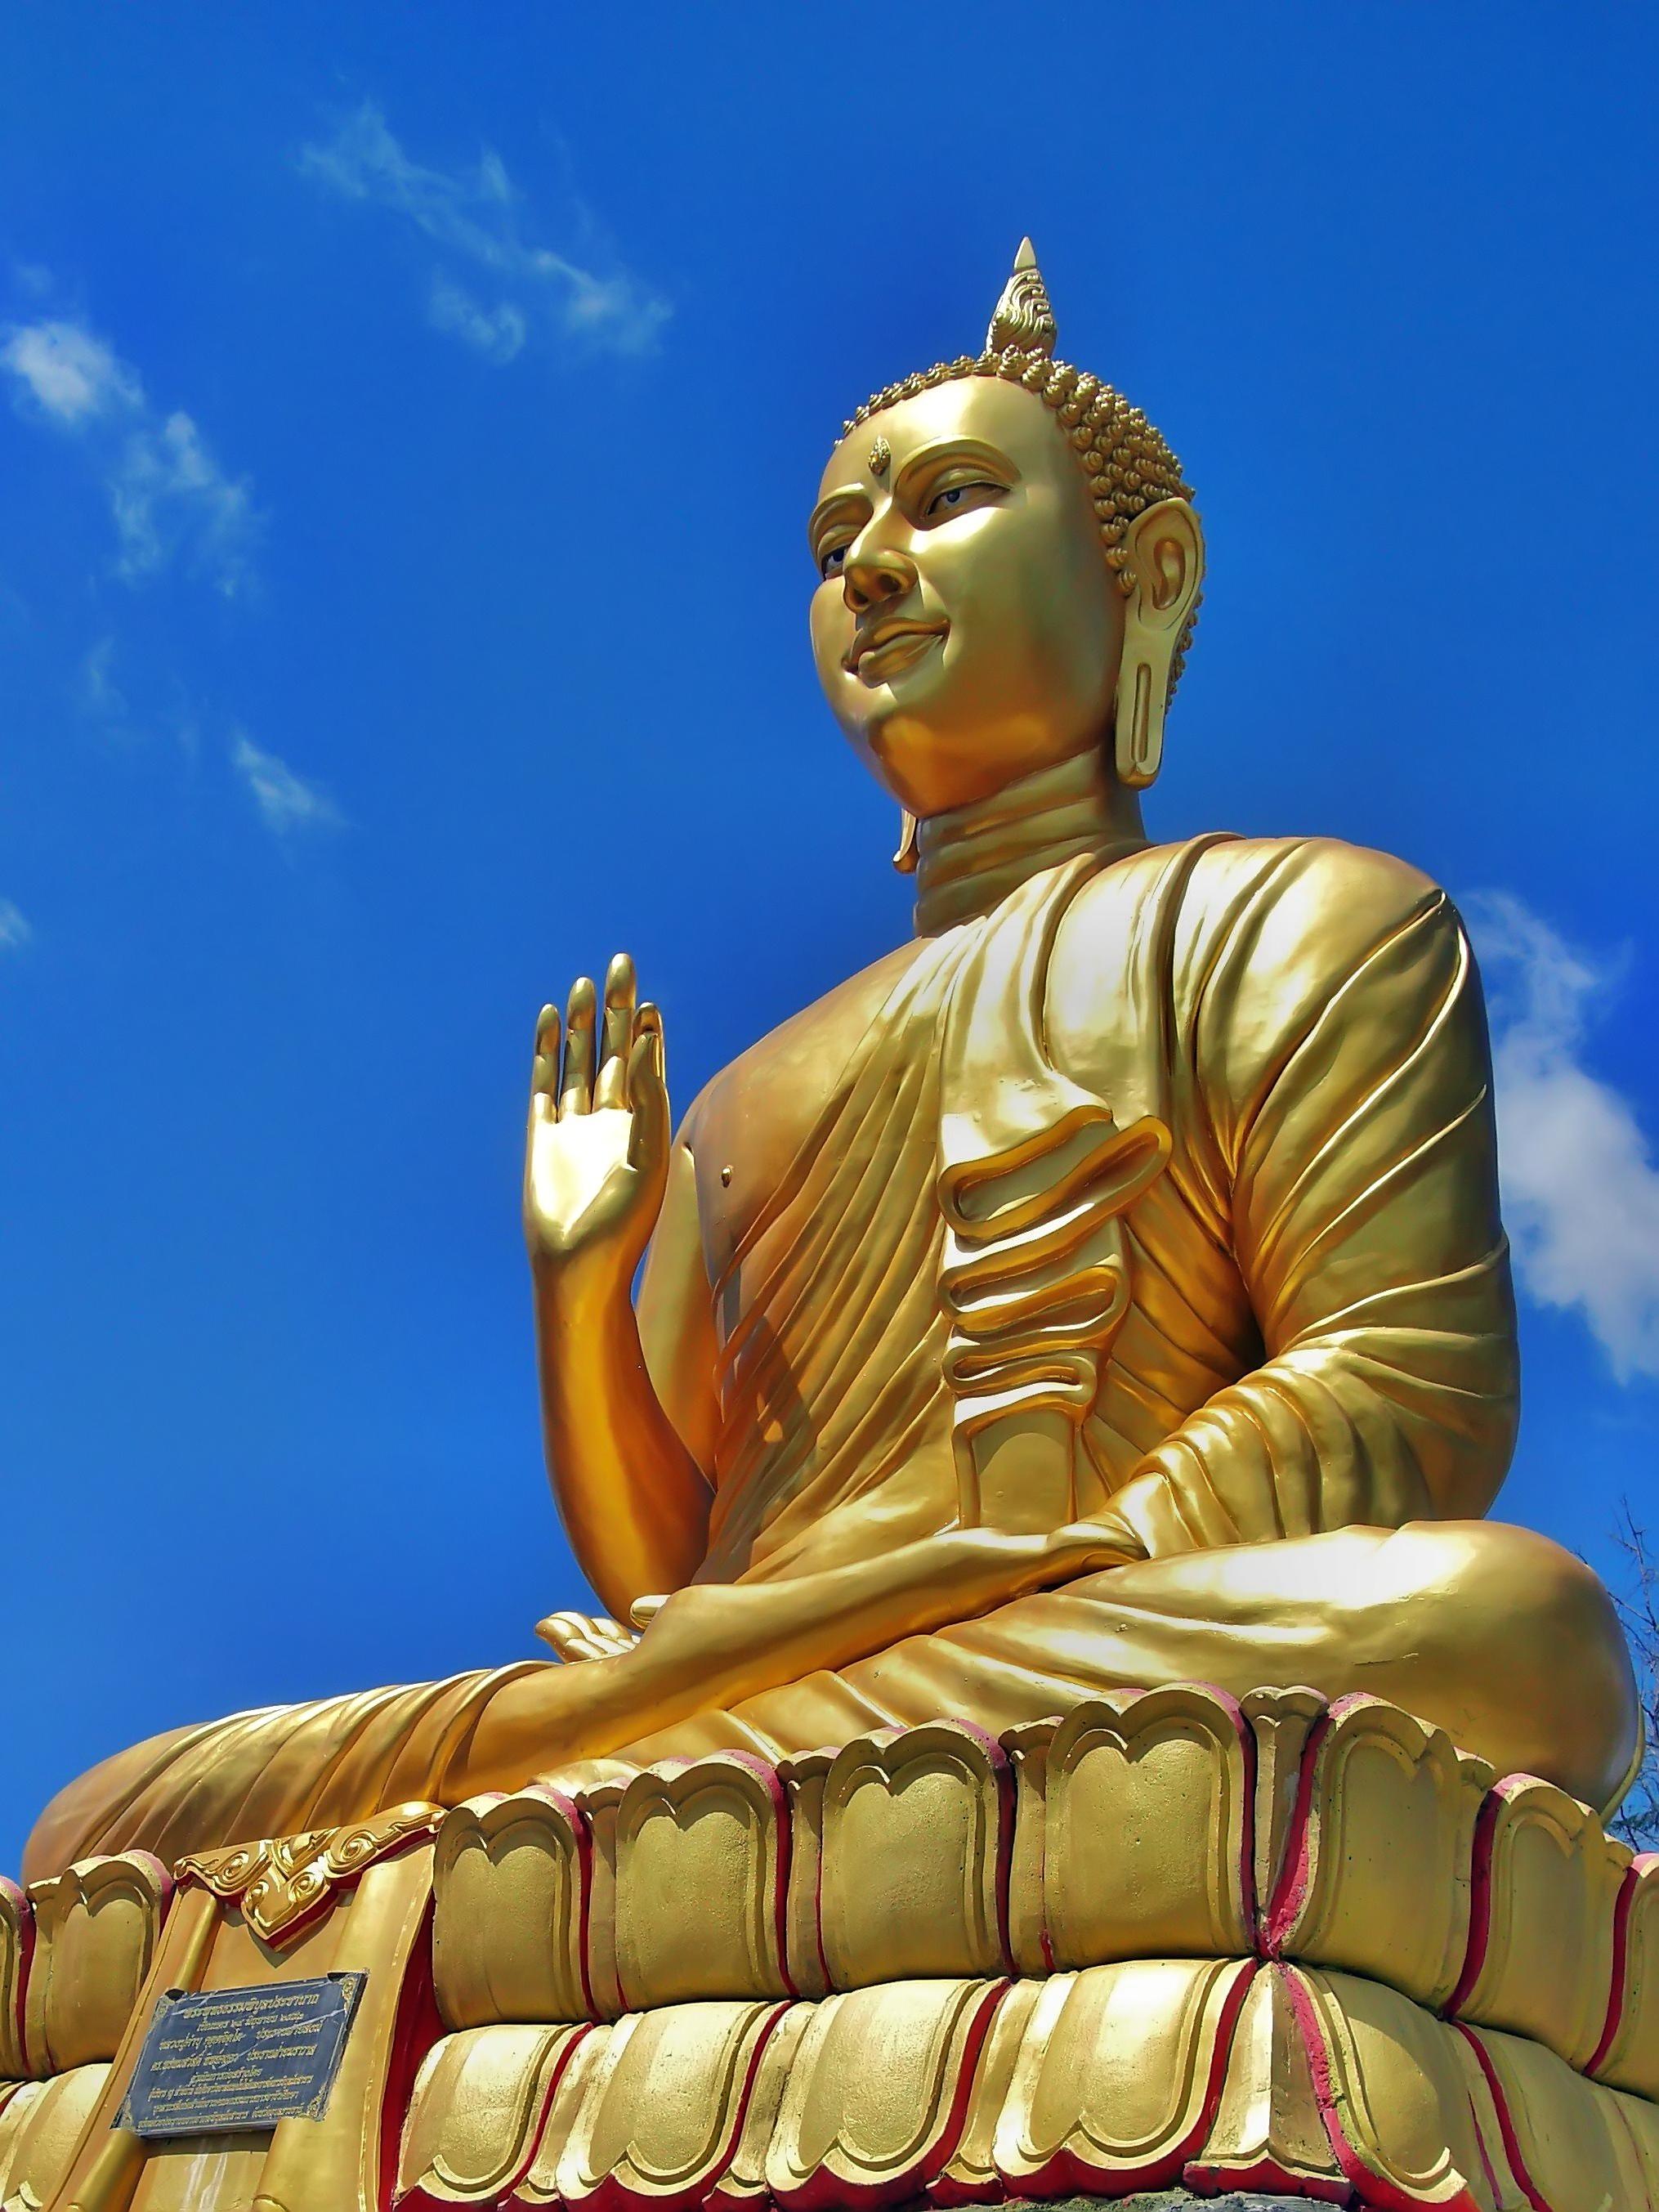 Eccezionale A DI DA PHAT BUDDHA THAILAND Golden Buddha 08 by kwanyinbuddha on  PJ72